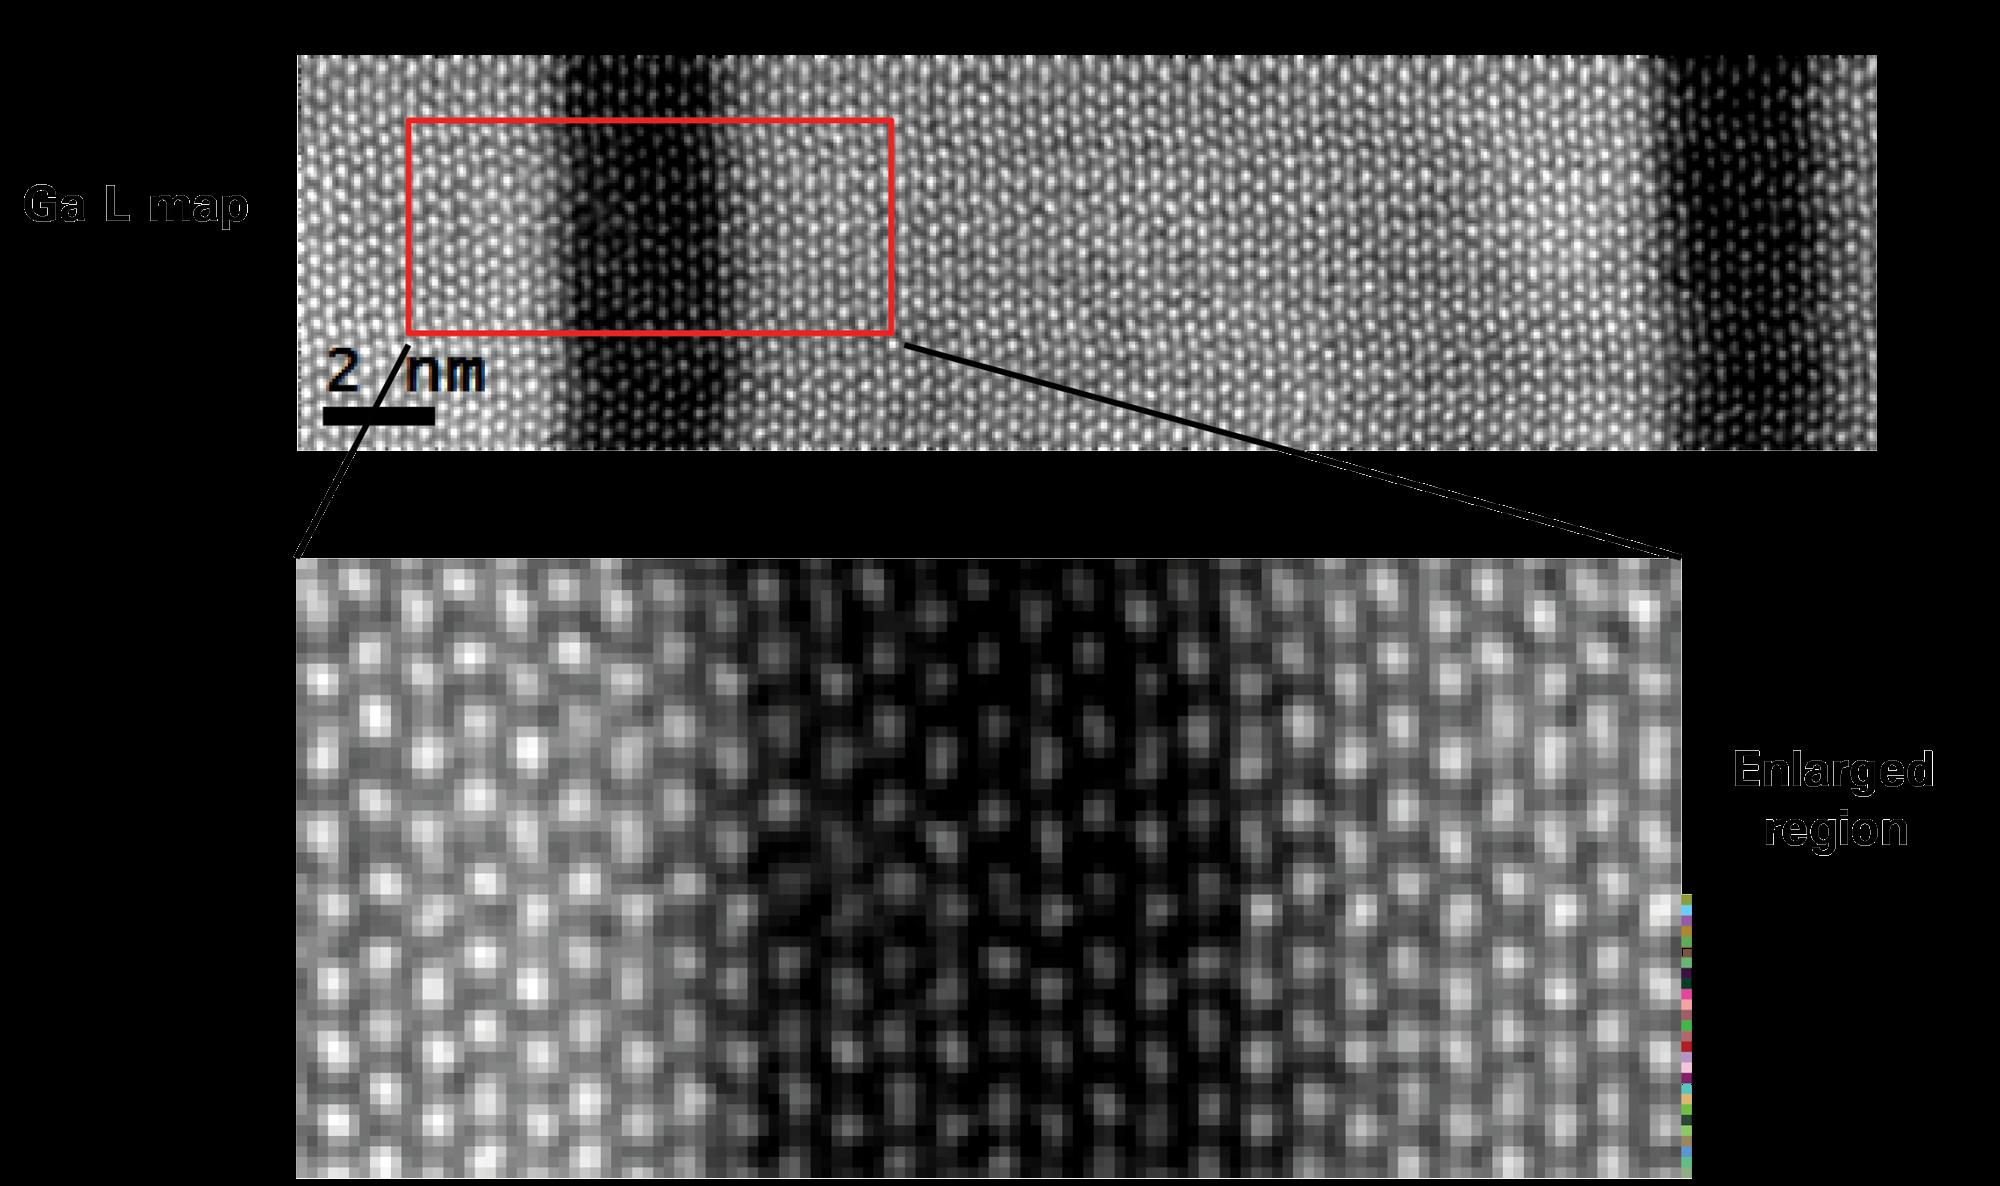 Atomic level EELS prepared in PIPS II system following FIB preparation (image 2)